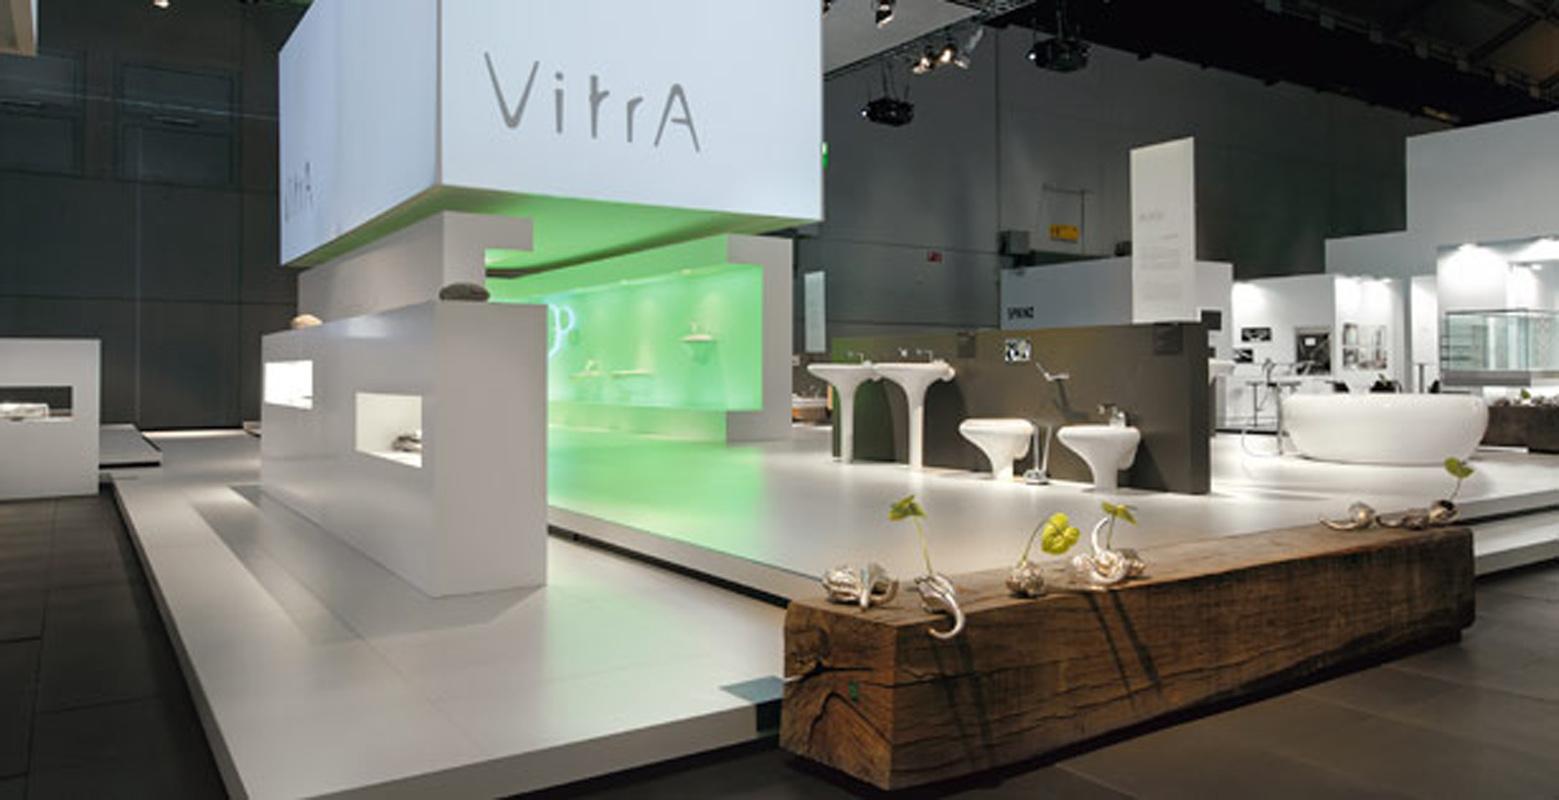 la nuova linea bagno vitra presso ish frankfurt 2015. Black Bedroom Furniture Sets. Home Design Ideas